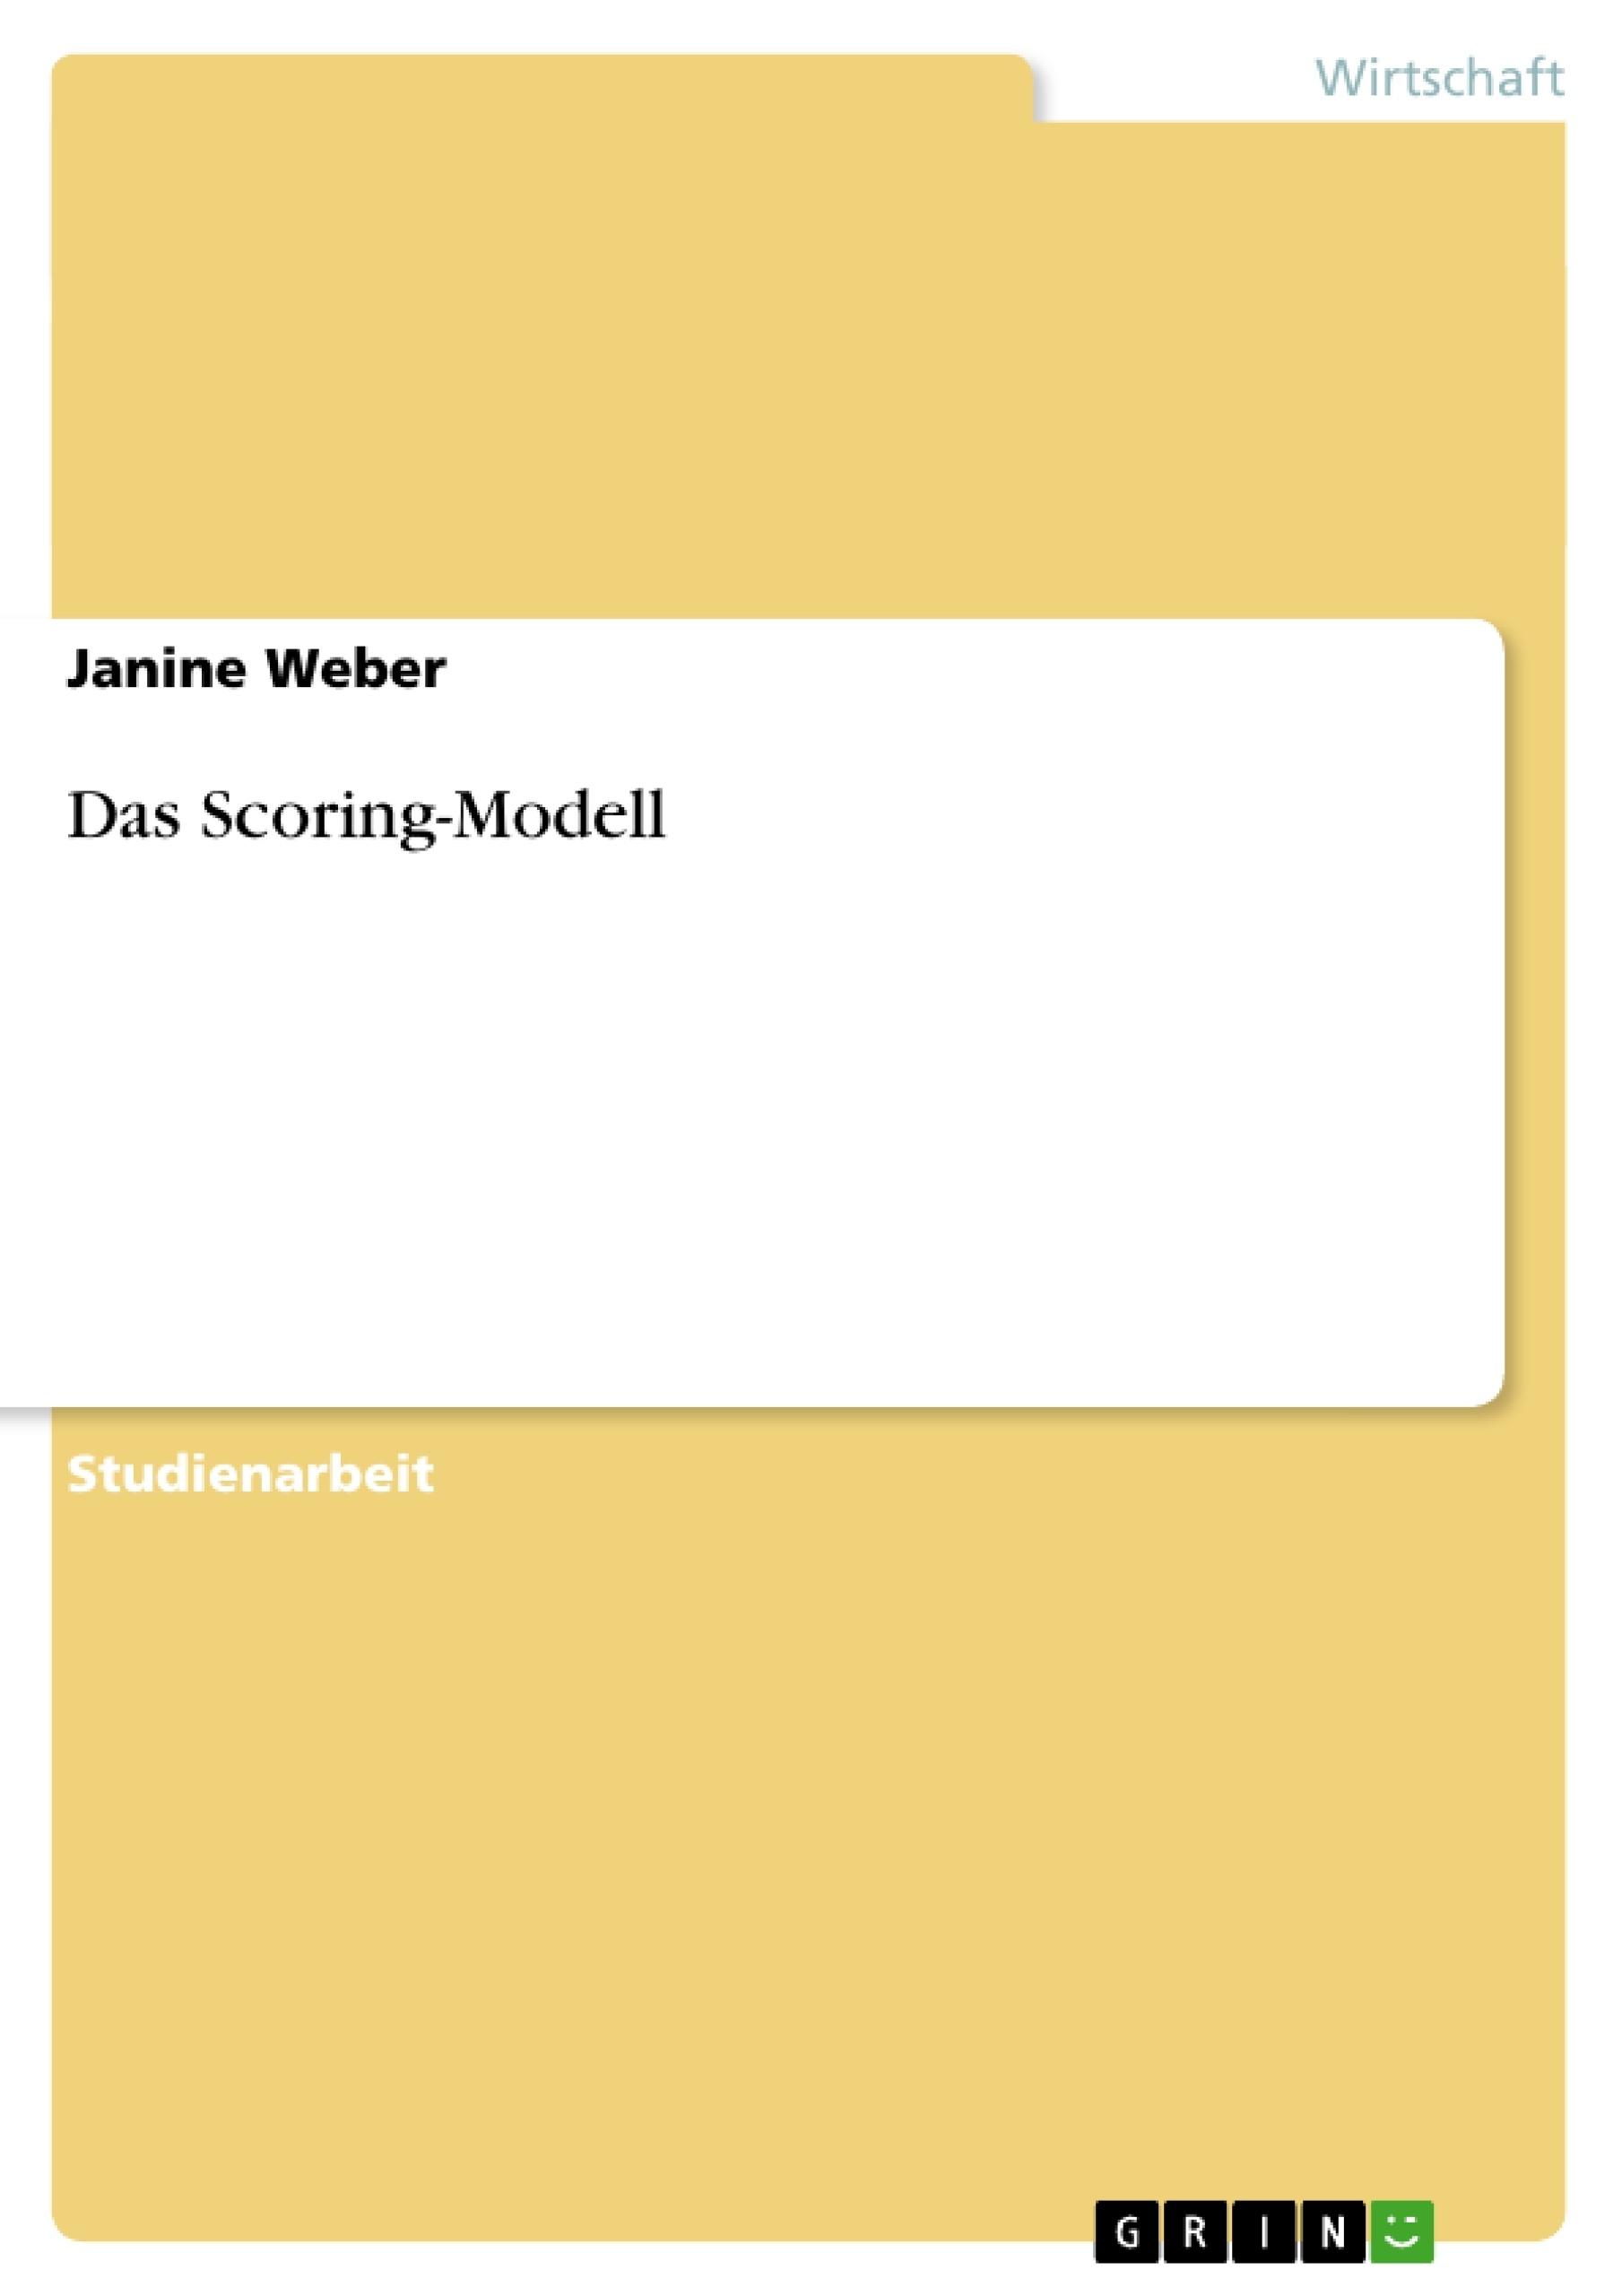 Titel: Das Scoring-Modell